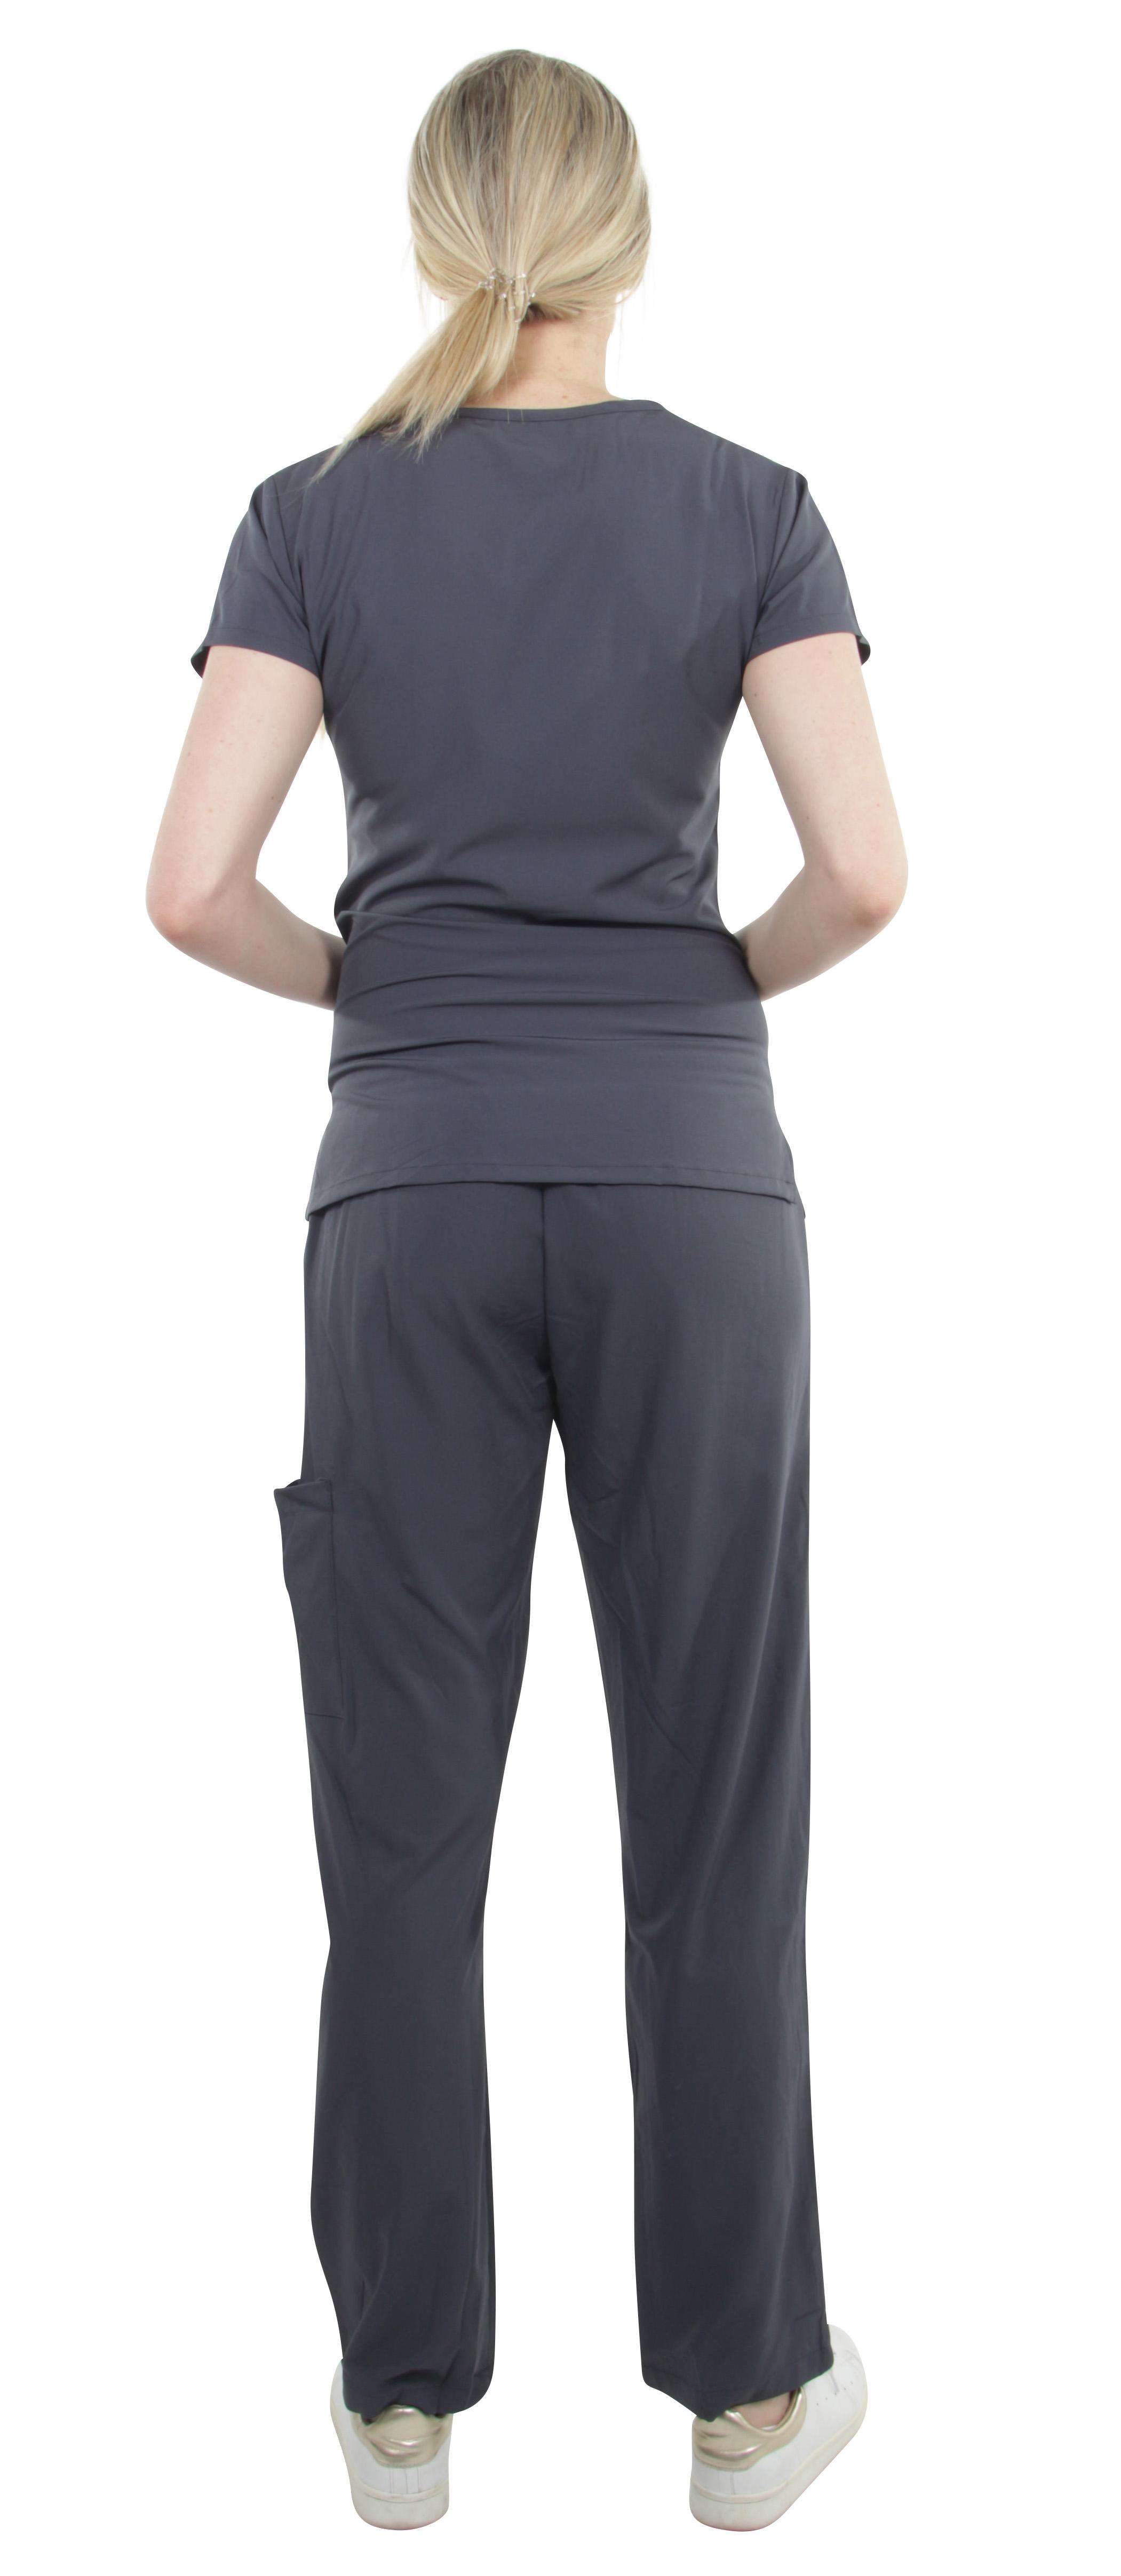 Unisex-Performance-Stretch-Medical-Uniform-Five-Pockets-V-Neck-Scrubs-Sets miniature 48